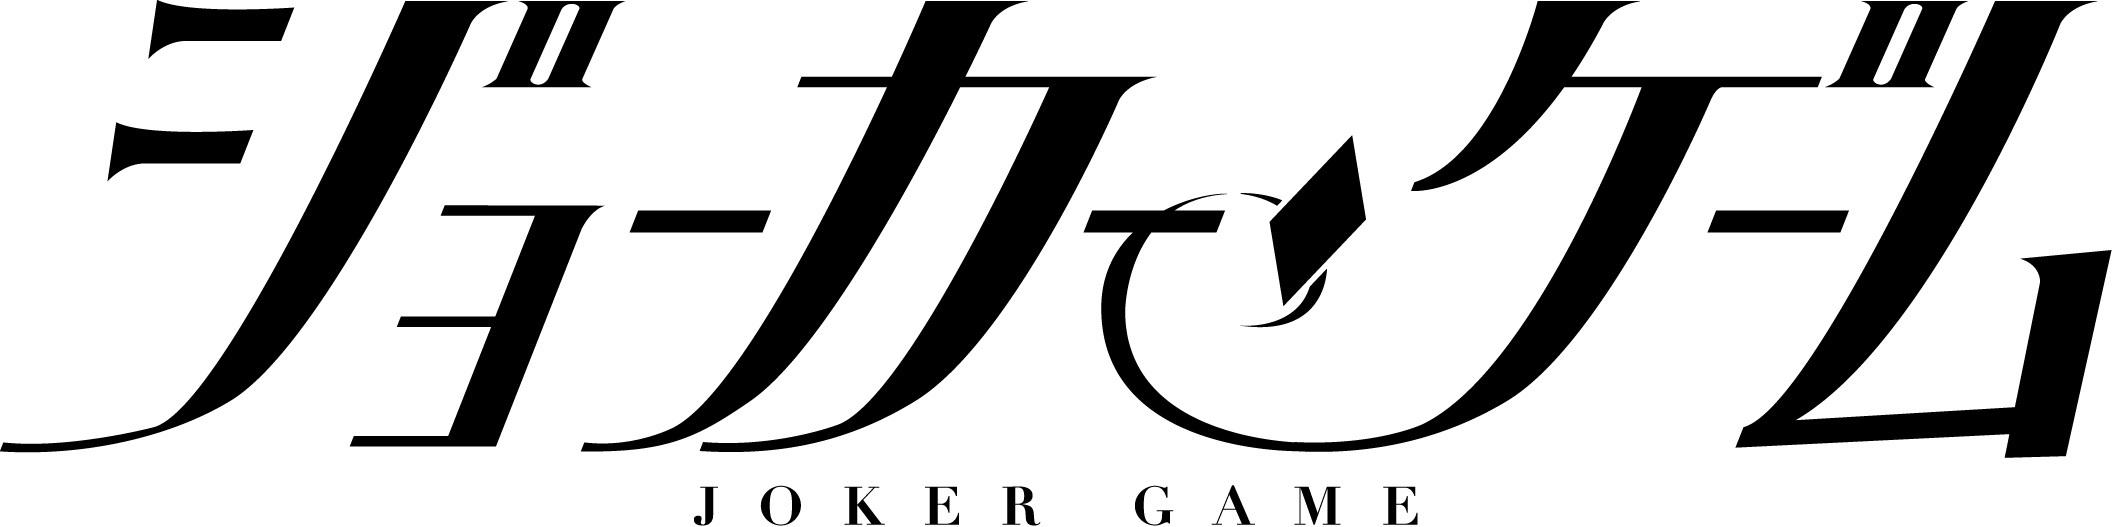 (C)柳広司・KADOKAWA/JOKER GAME ANIMATION PROJECT (C)JOKER GAME THE STAGE PROJECT